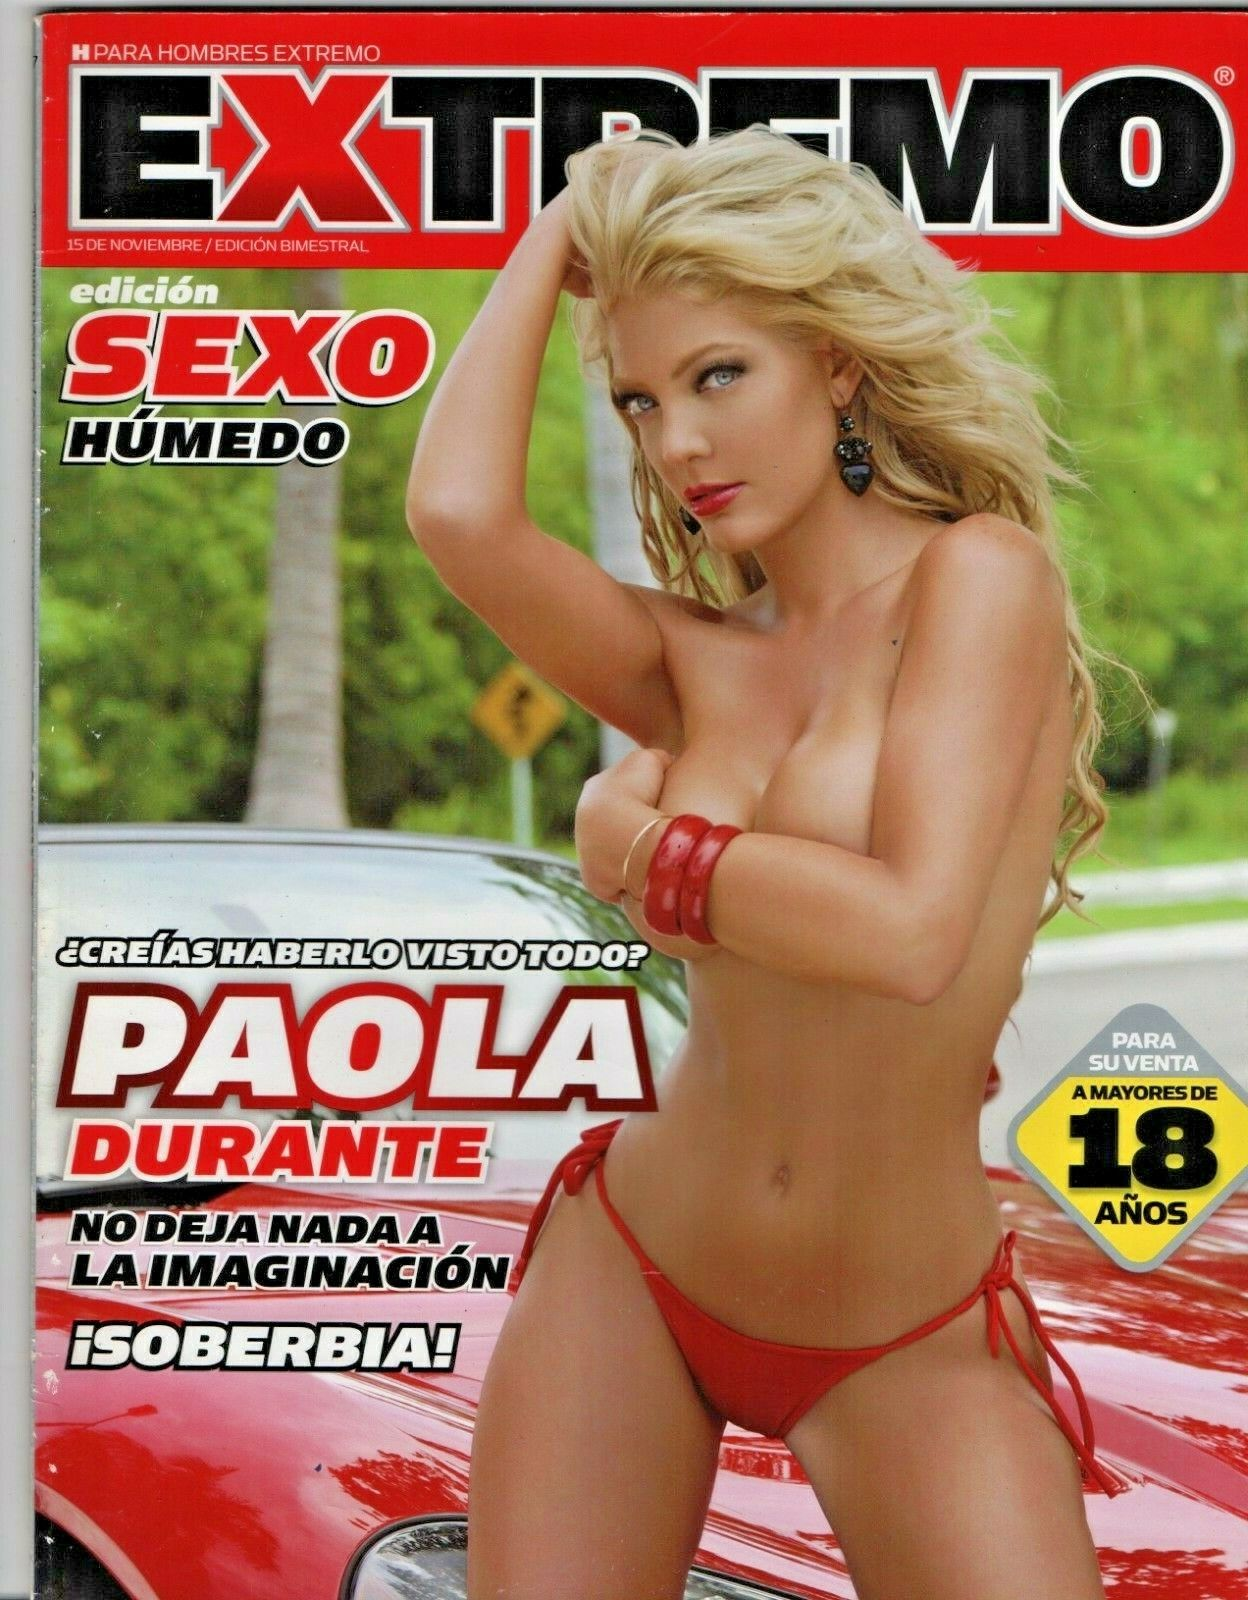 Altair Jarabo Revista H Старые журналы paola durante - h extremo: купить с доставкой